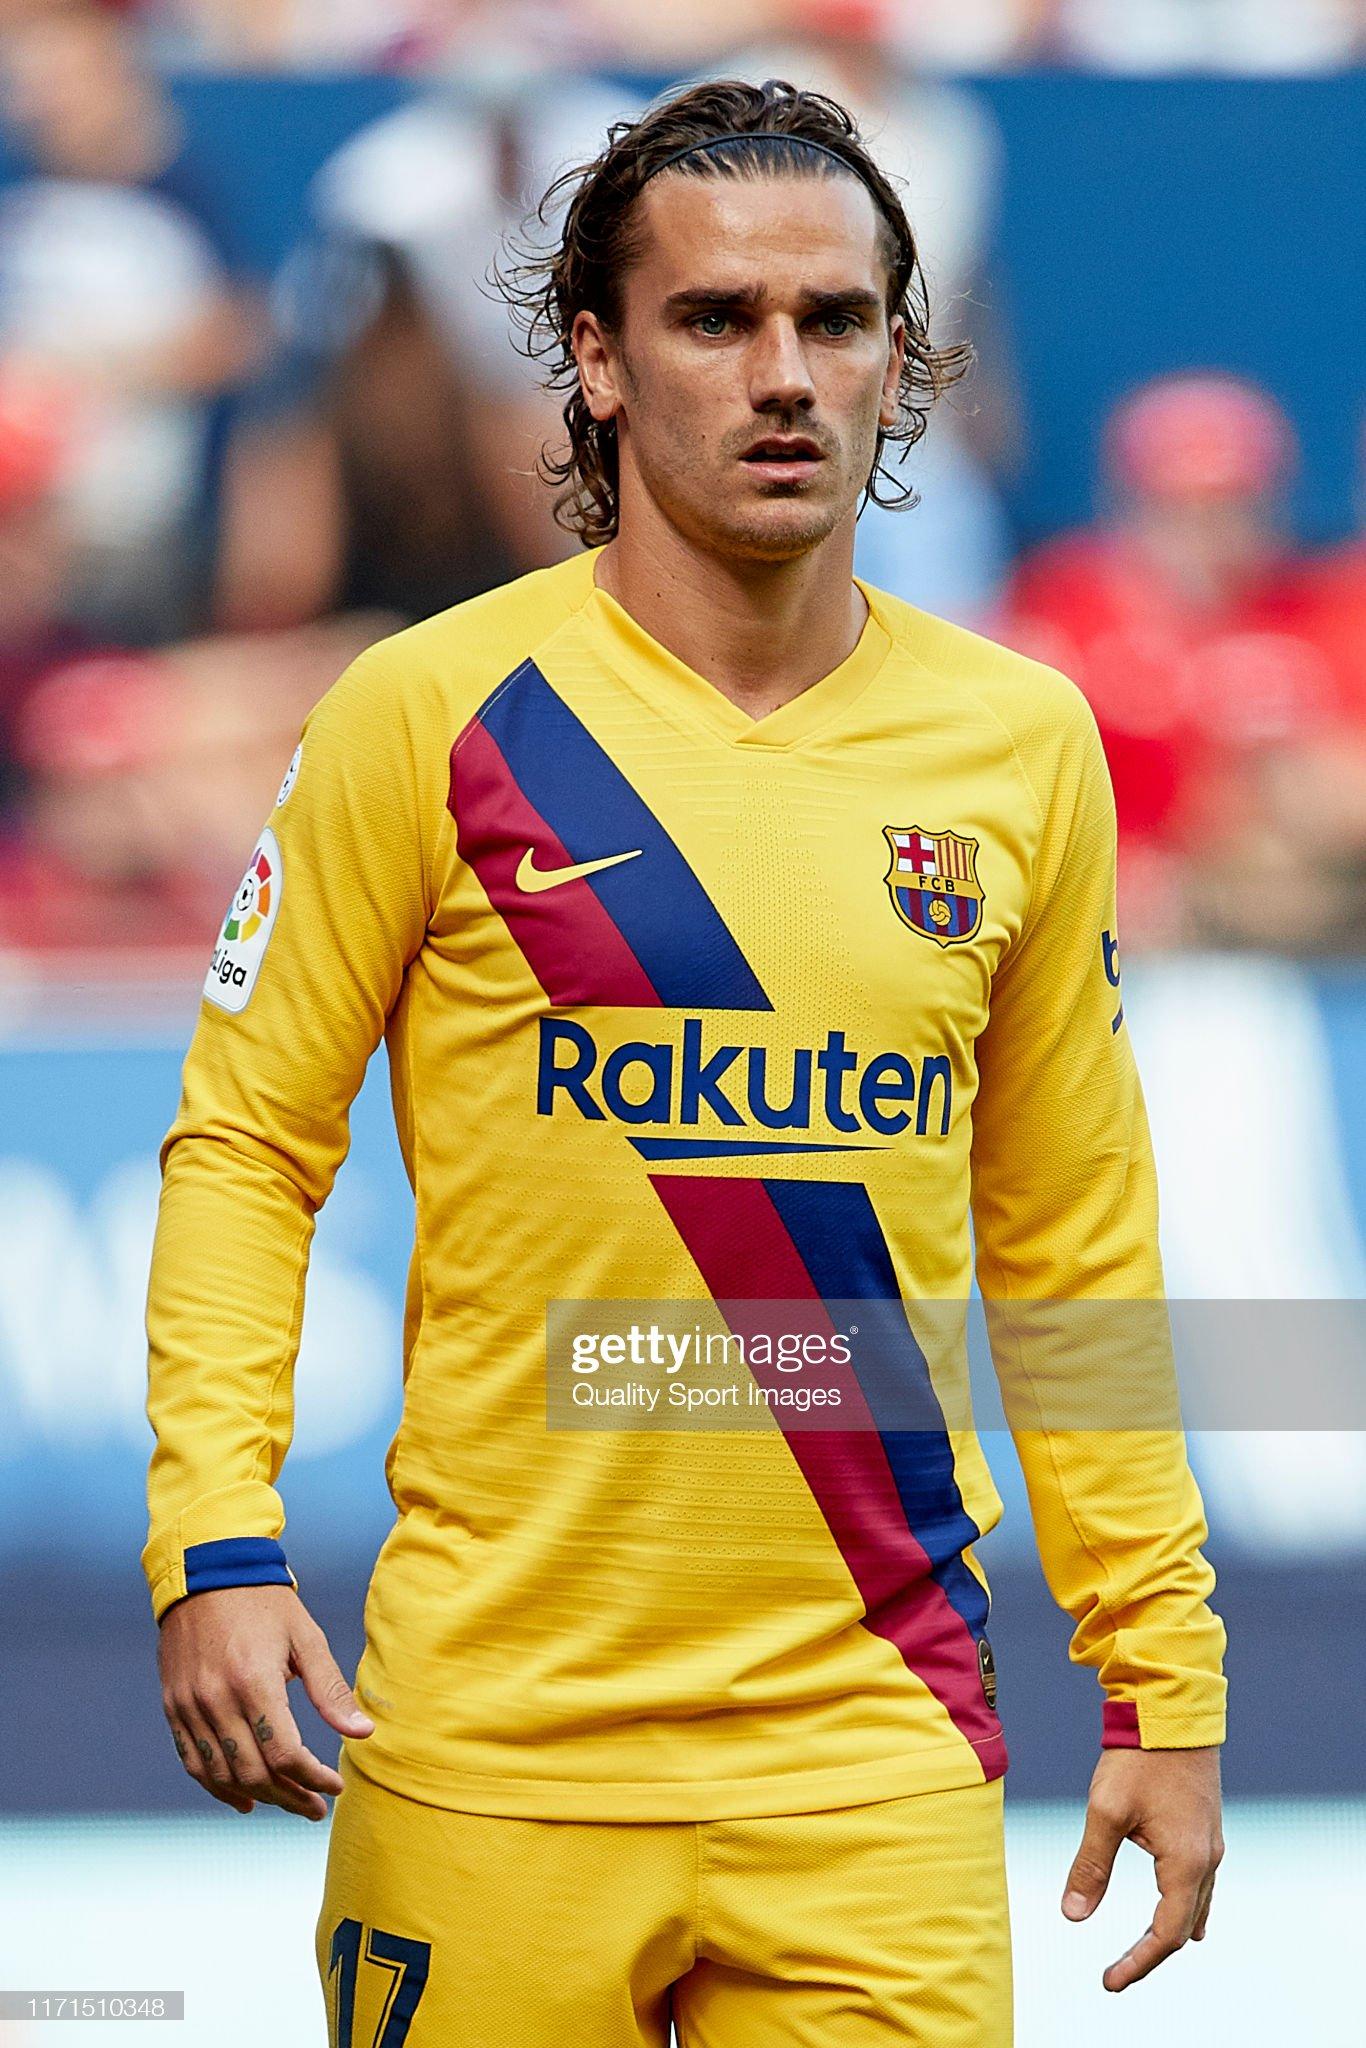 صور مباراة : أوساسونا - برشلونة 2-2 ( 31-08-2019 )  Antoine-griezmann-of-fc-barcelona-looks-on-during-the-liga-match-ca-picture-id1171510348?s=2048x2048